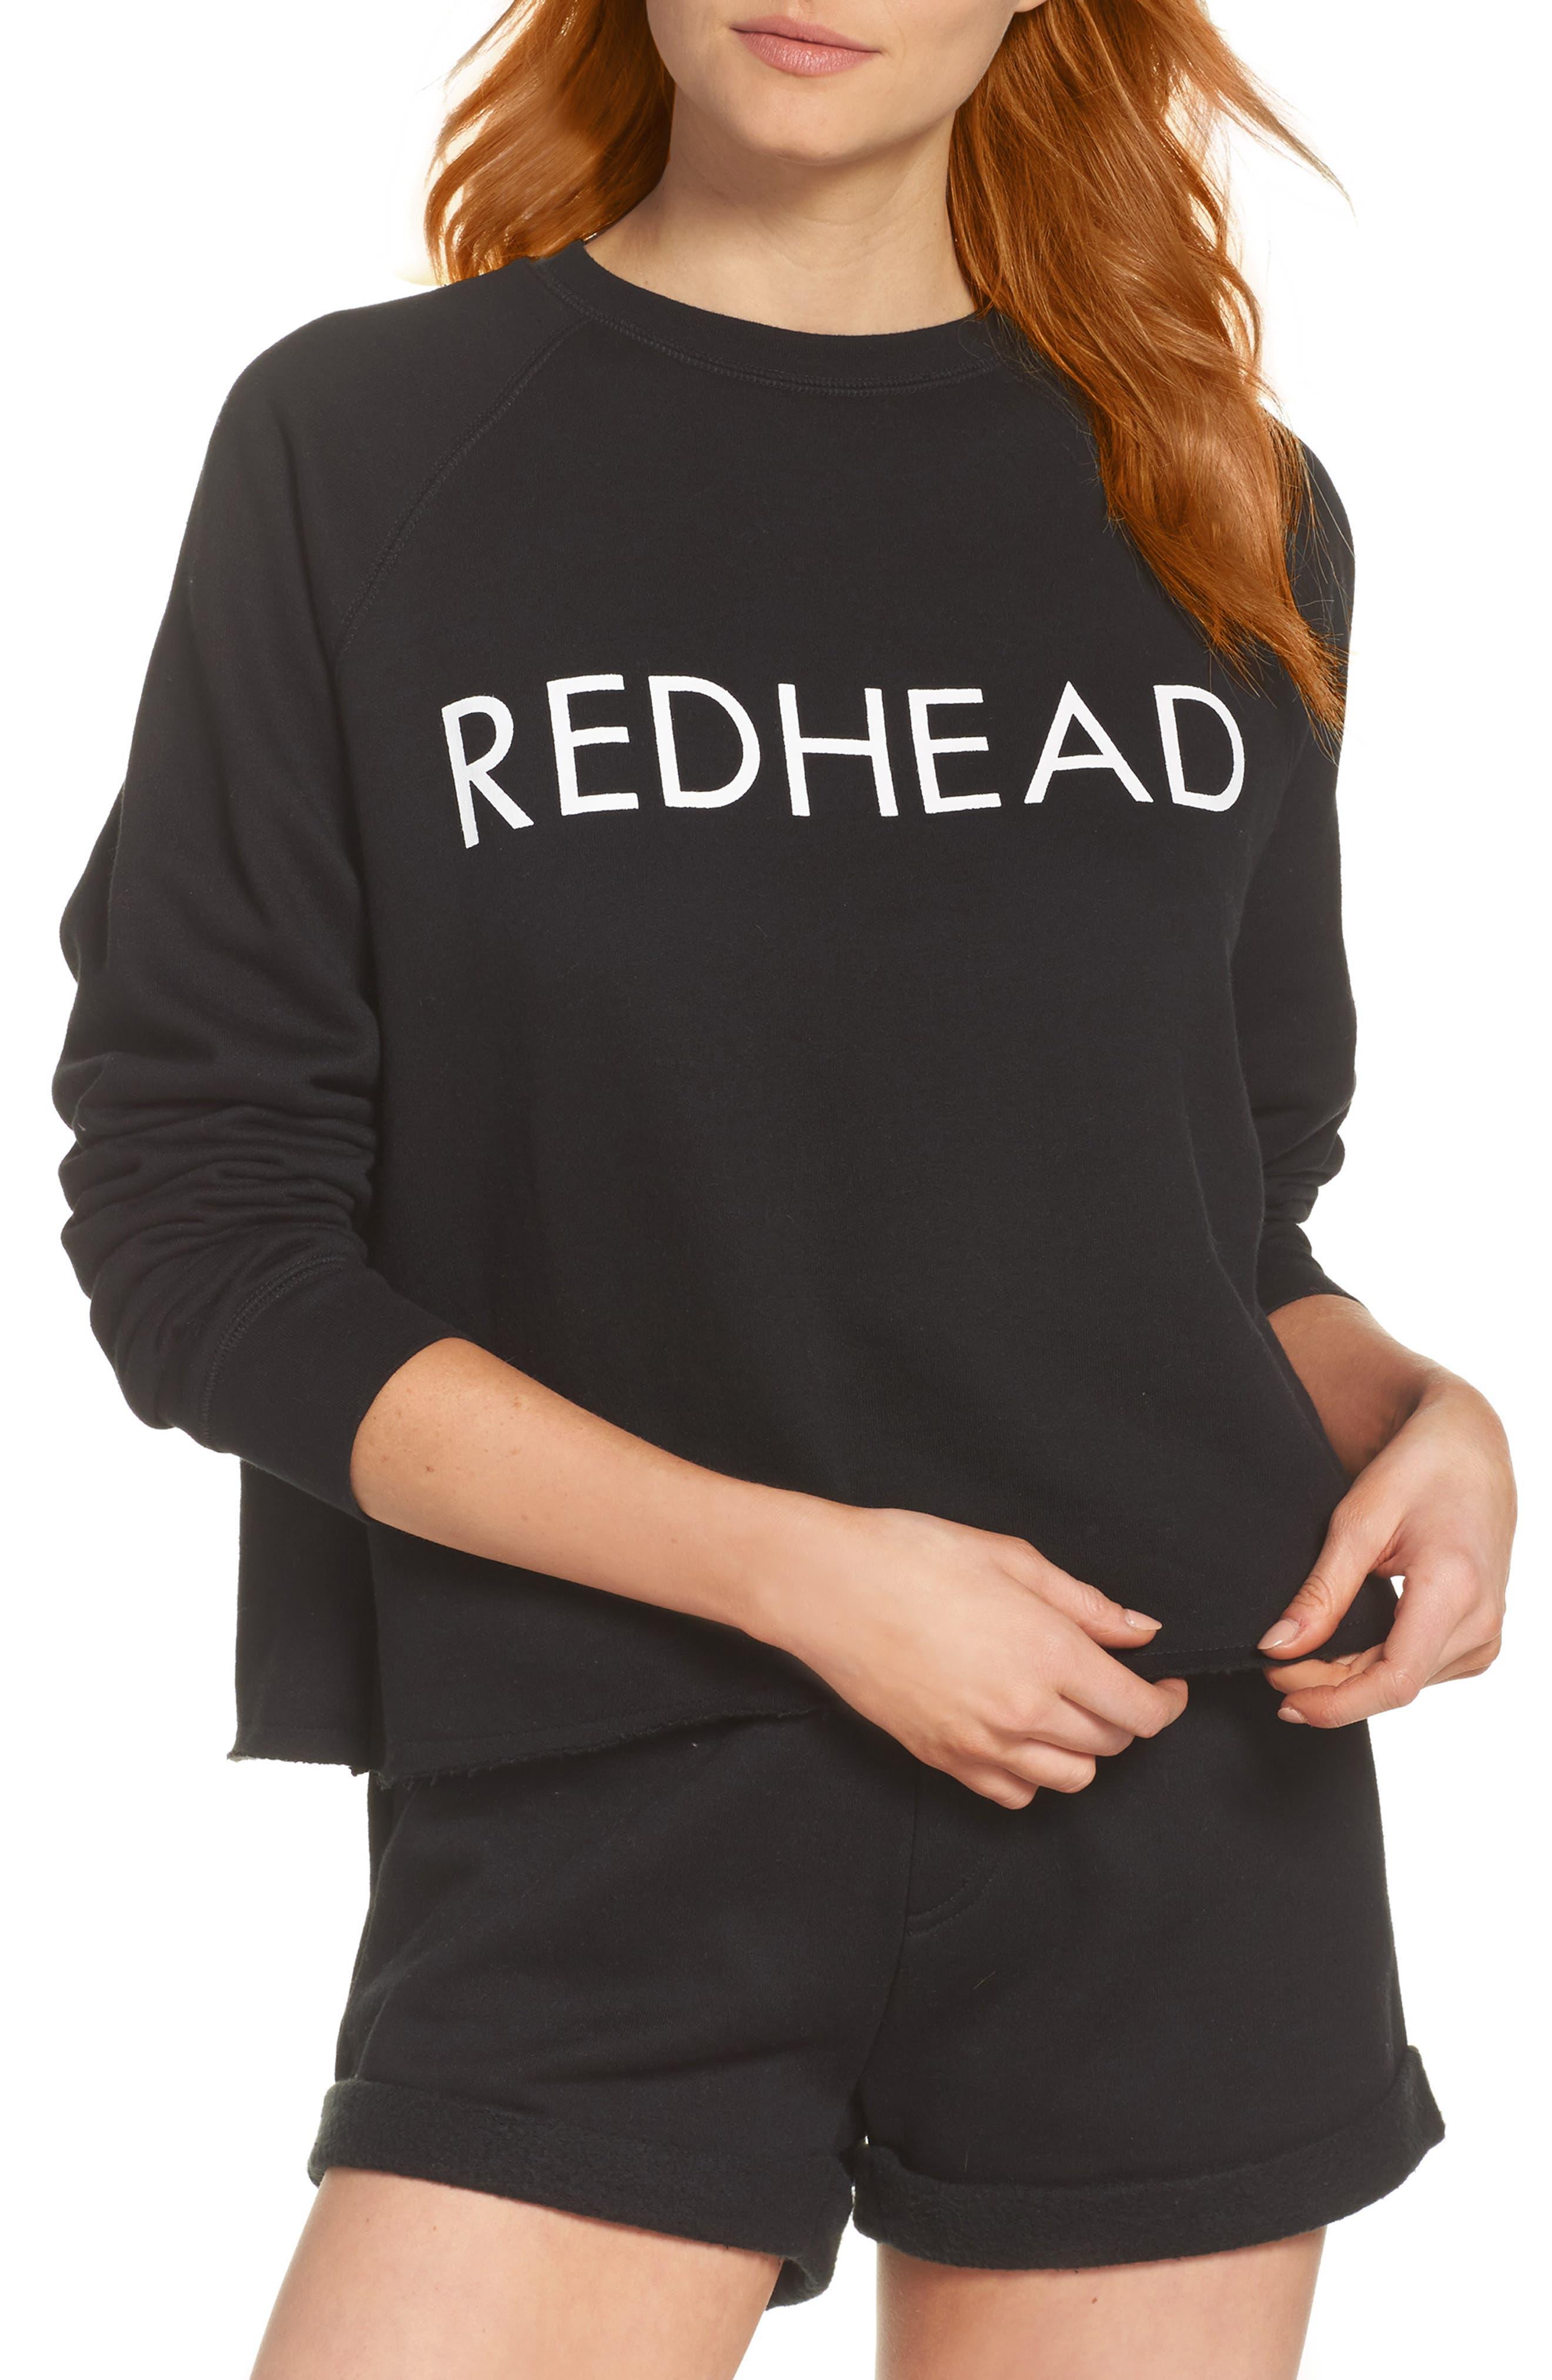 Redhead Raw Hem Sweatshirt,                         Main,                         color, Black